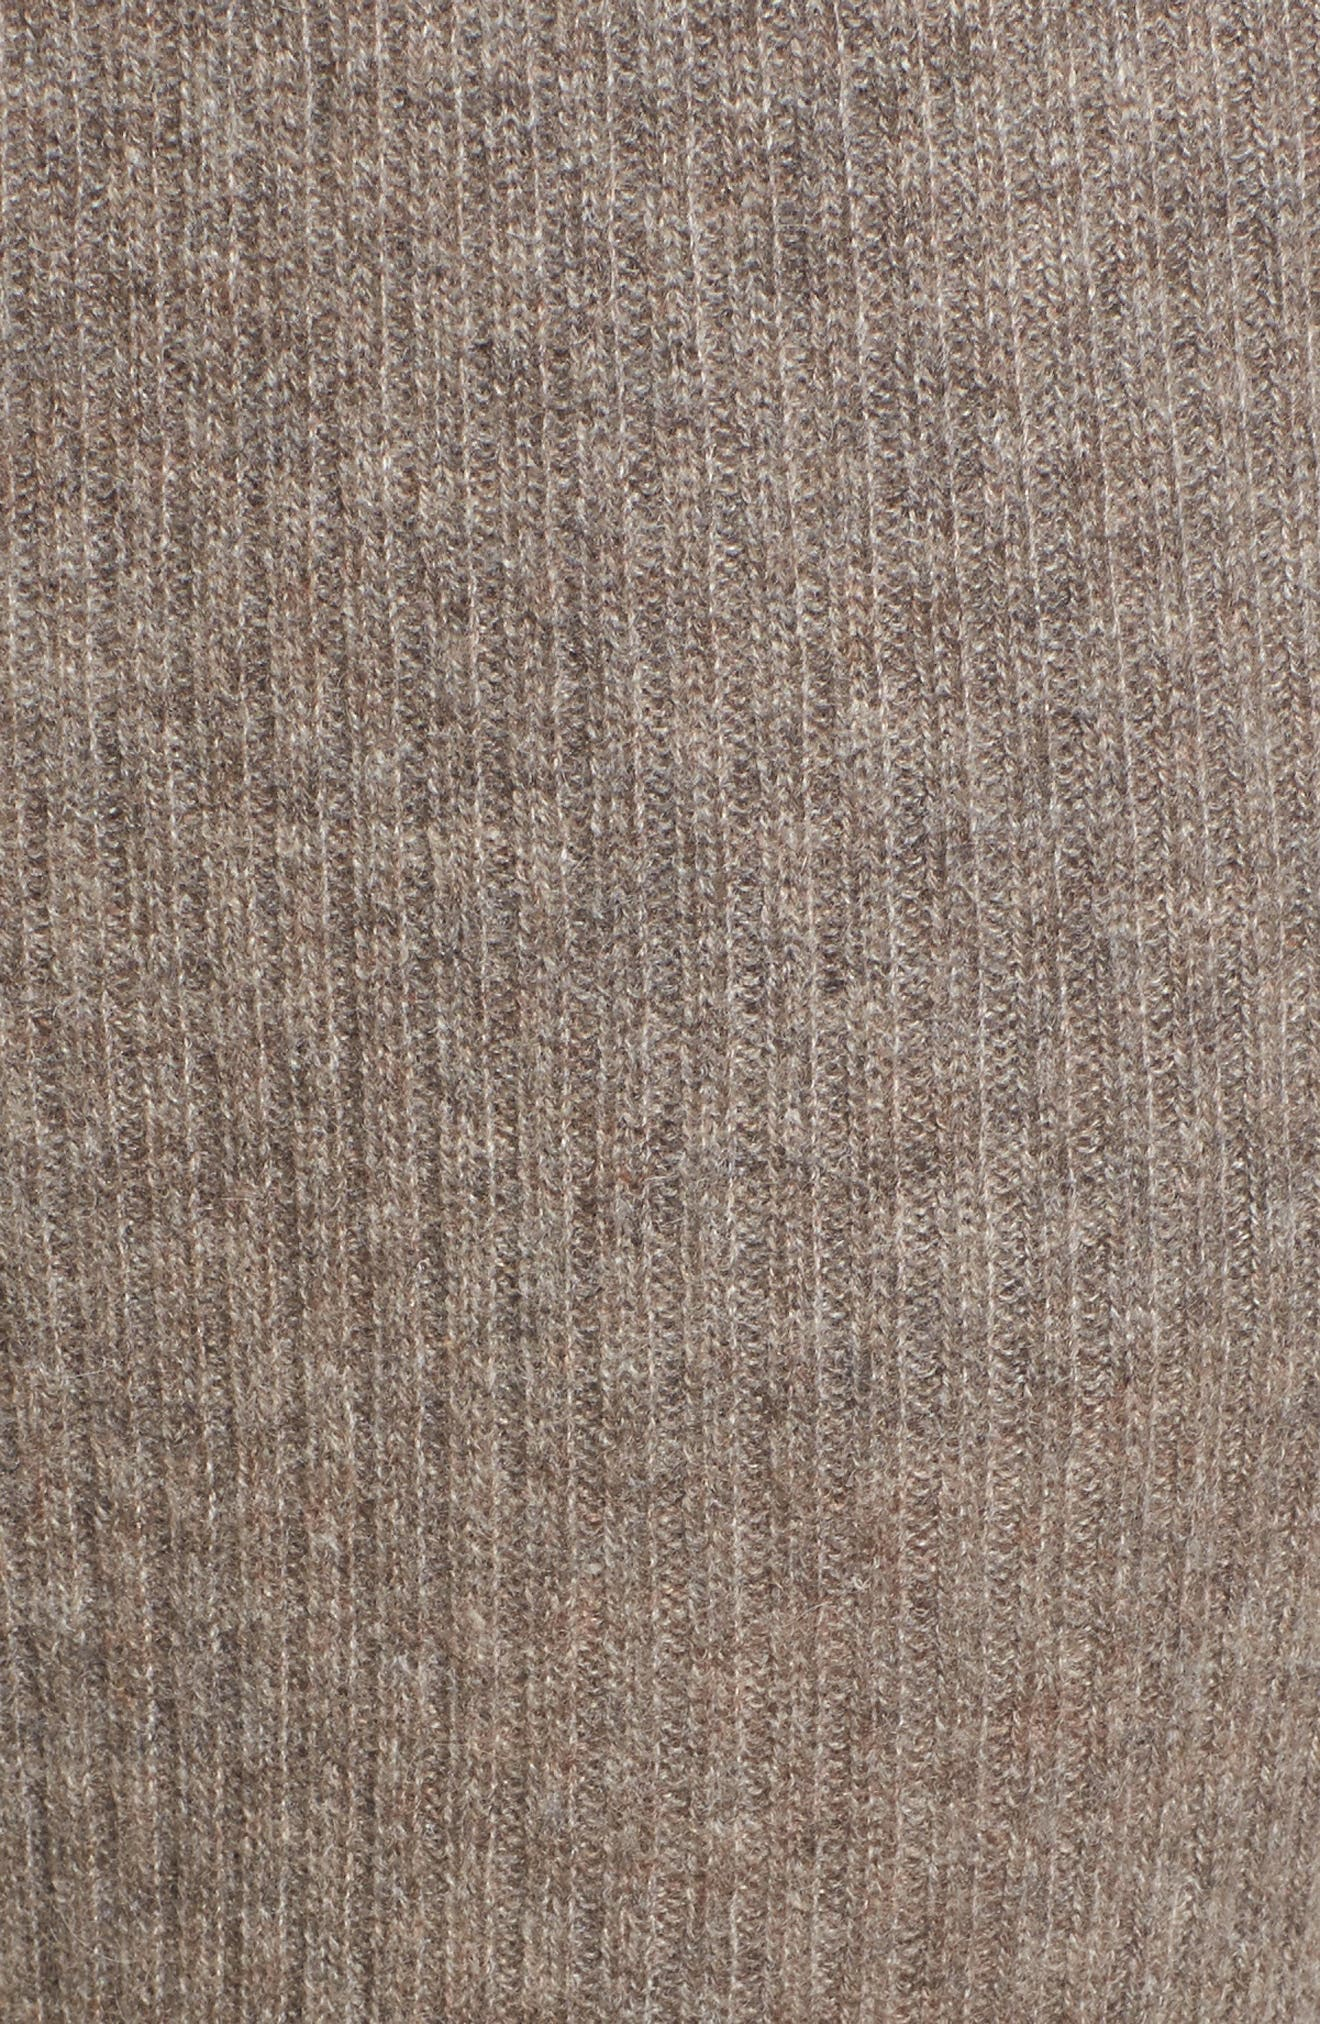 Ribbed Cashmere Leggings,                             Alternate thumbnail 6, color,                             Taupe Melange